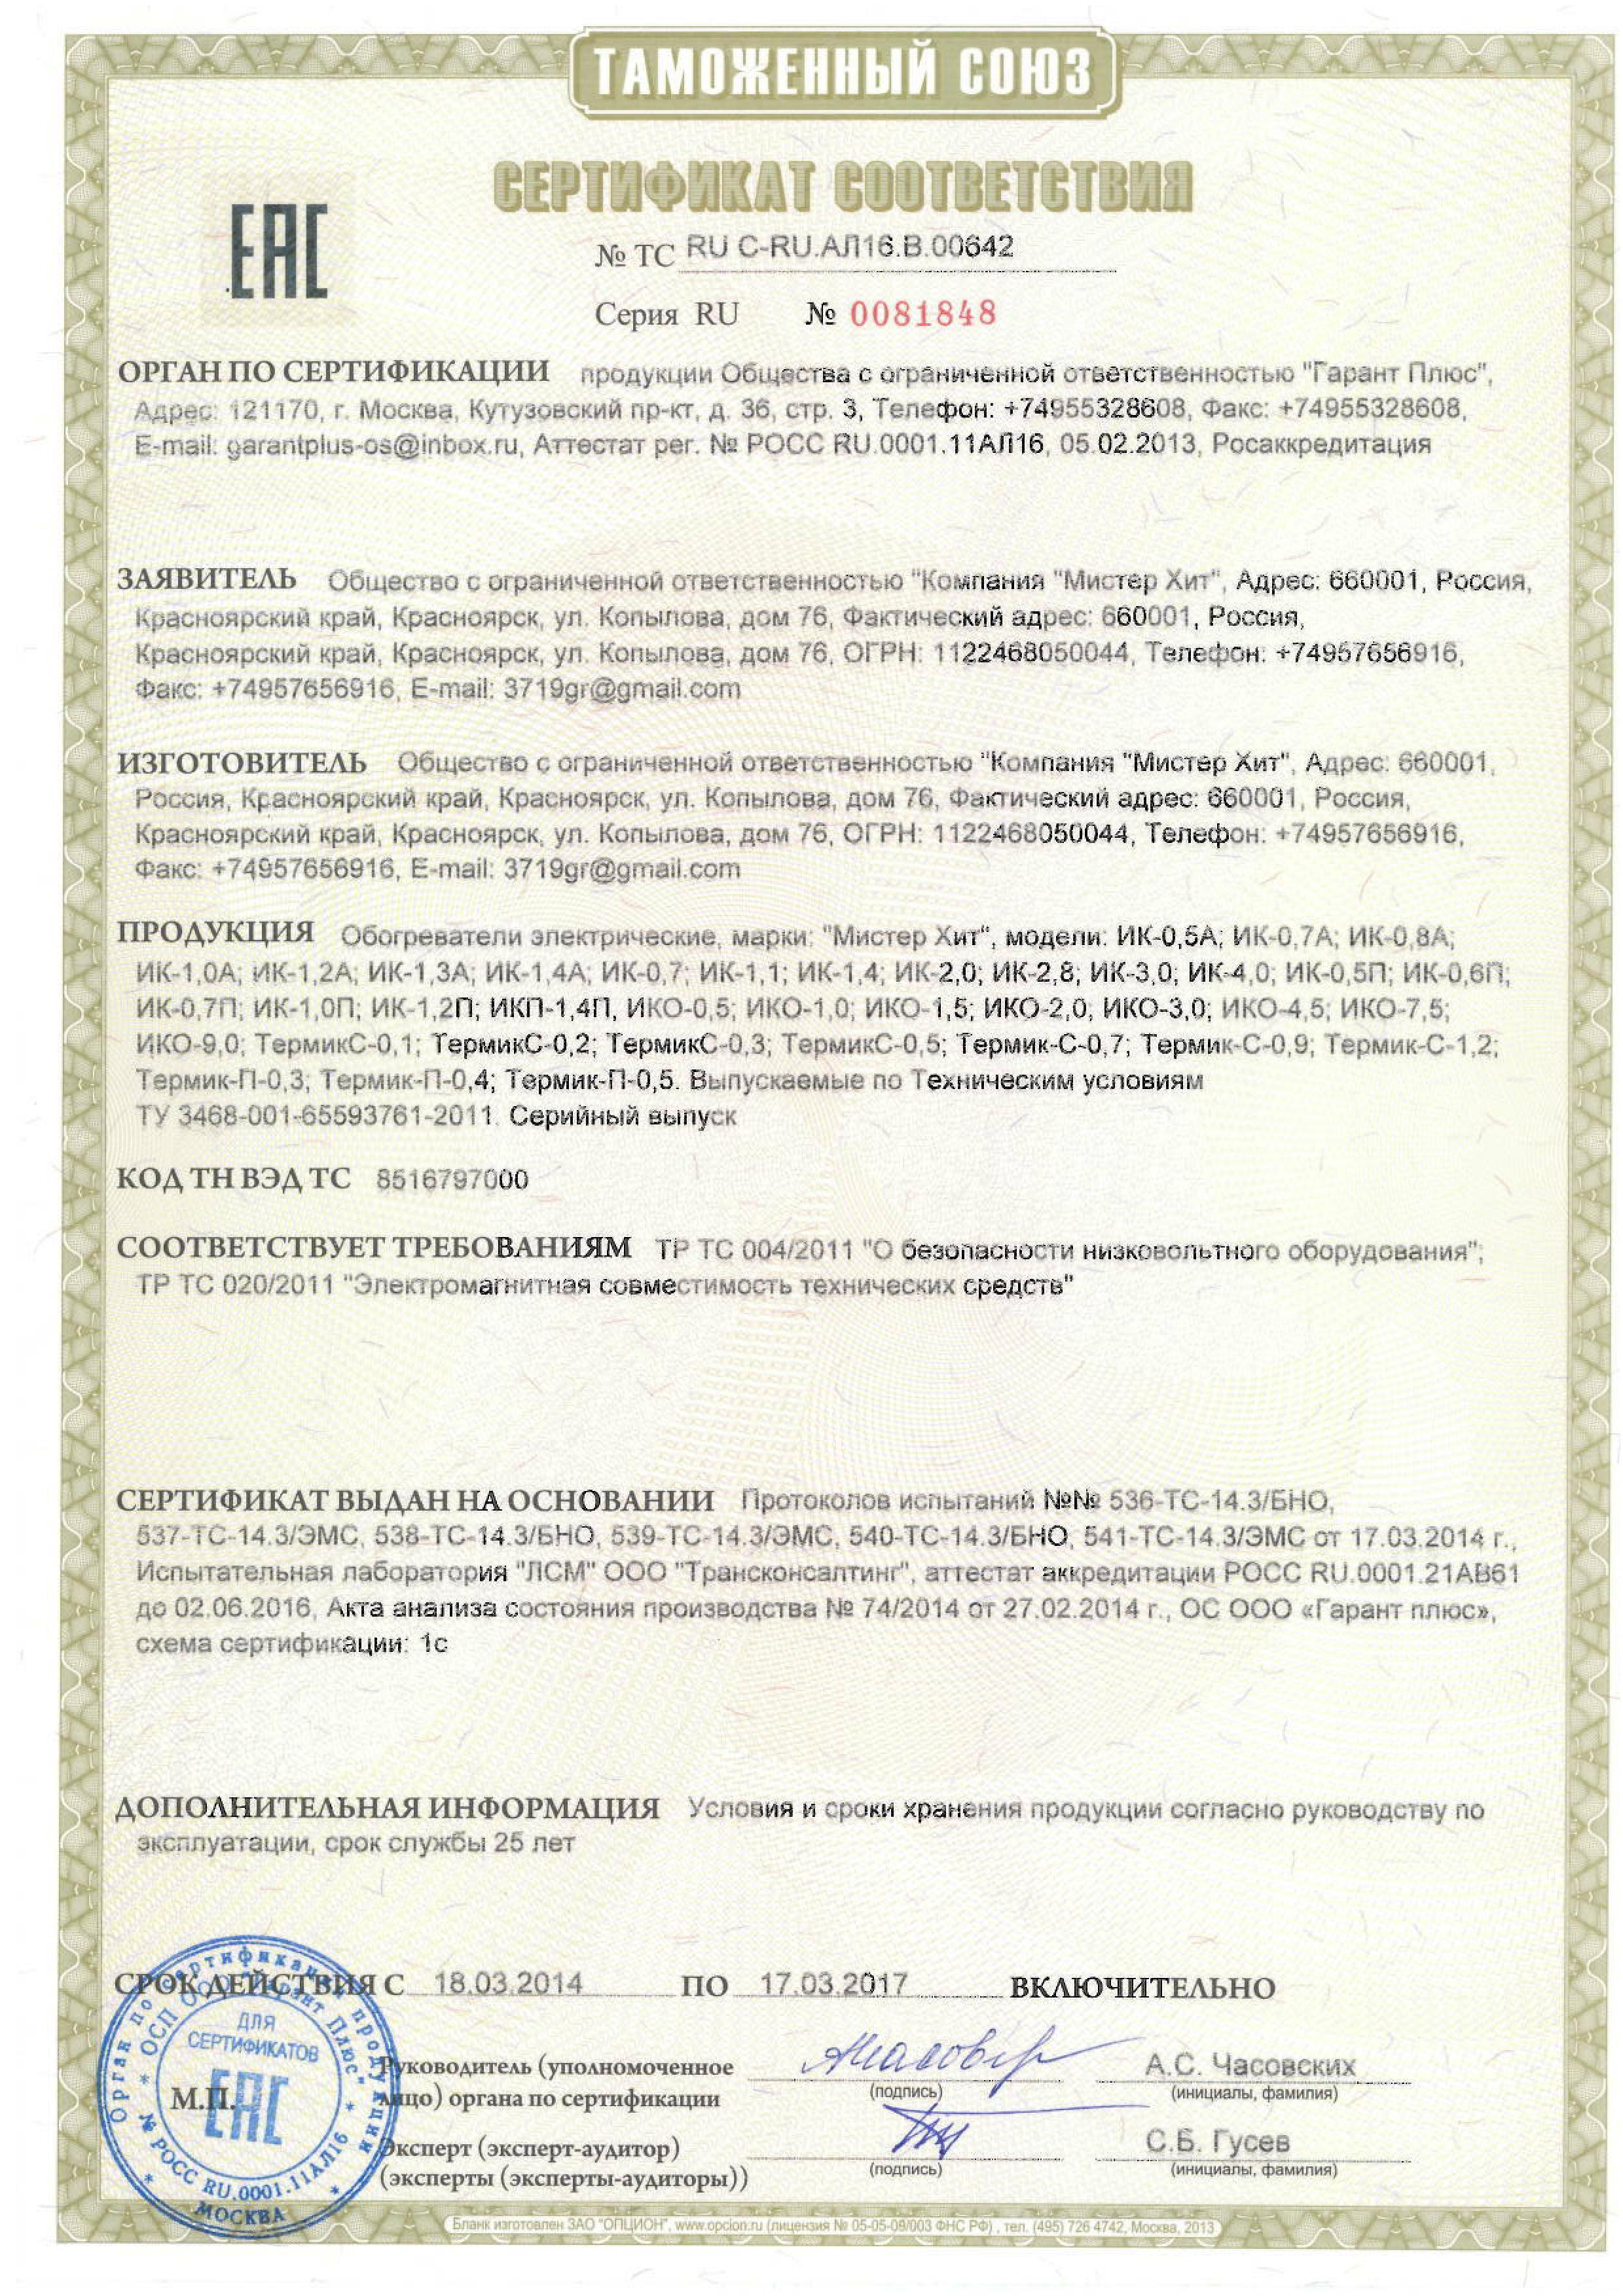 Сертификат соответствия на обогреватели Мистер-Хит